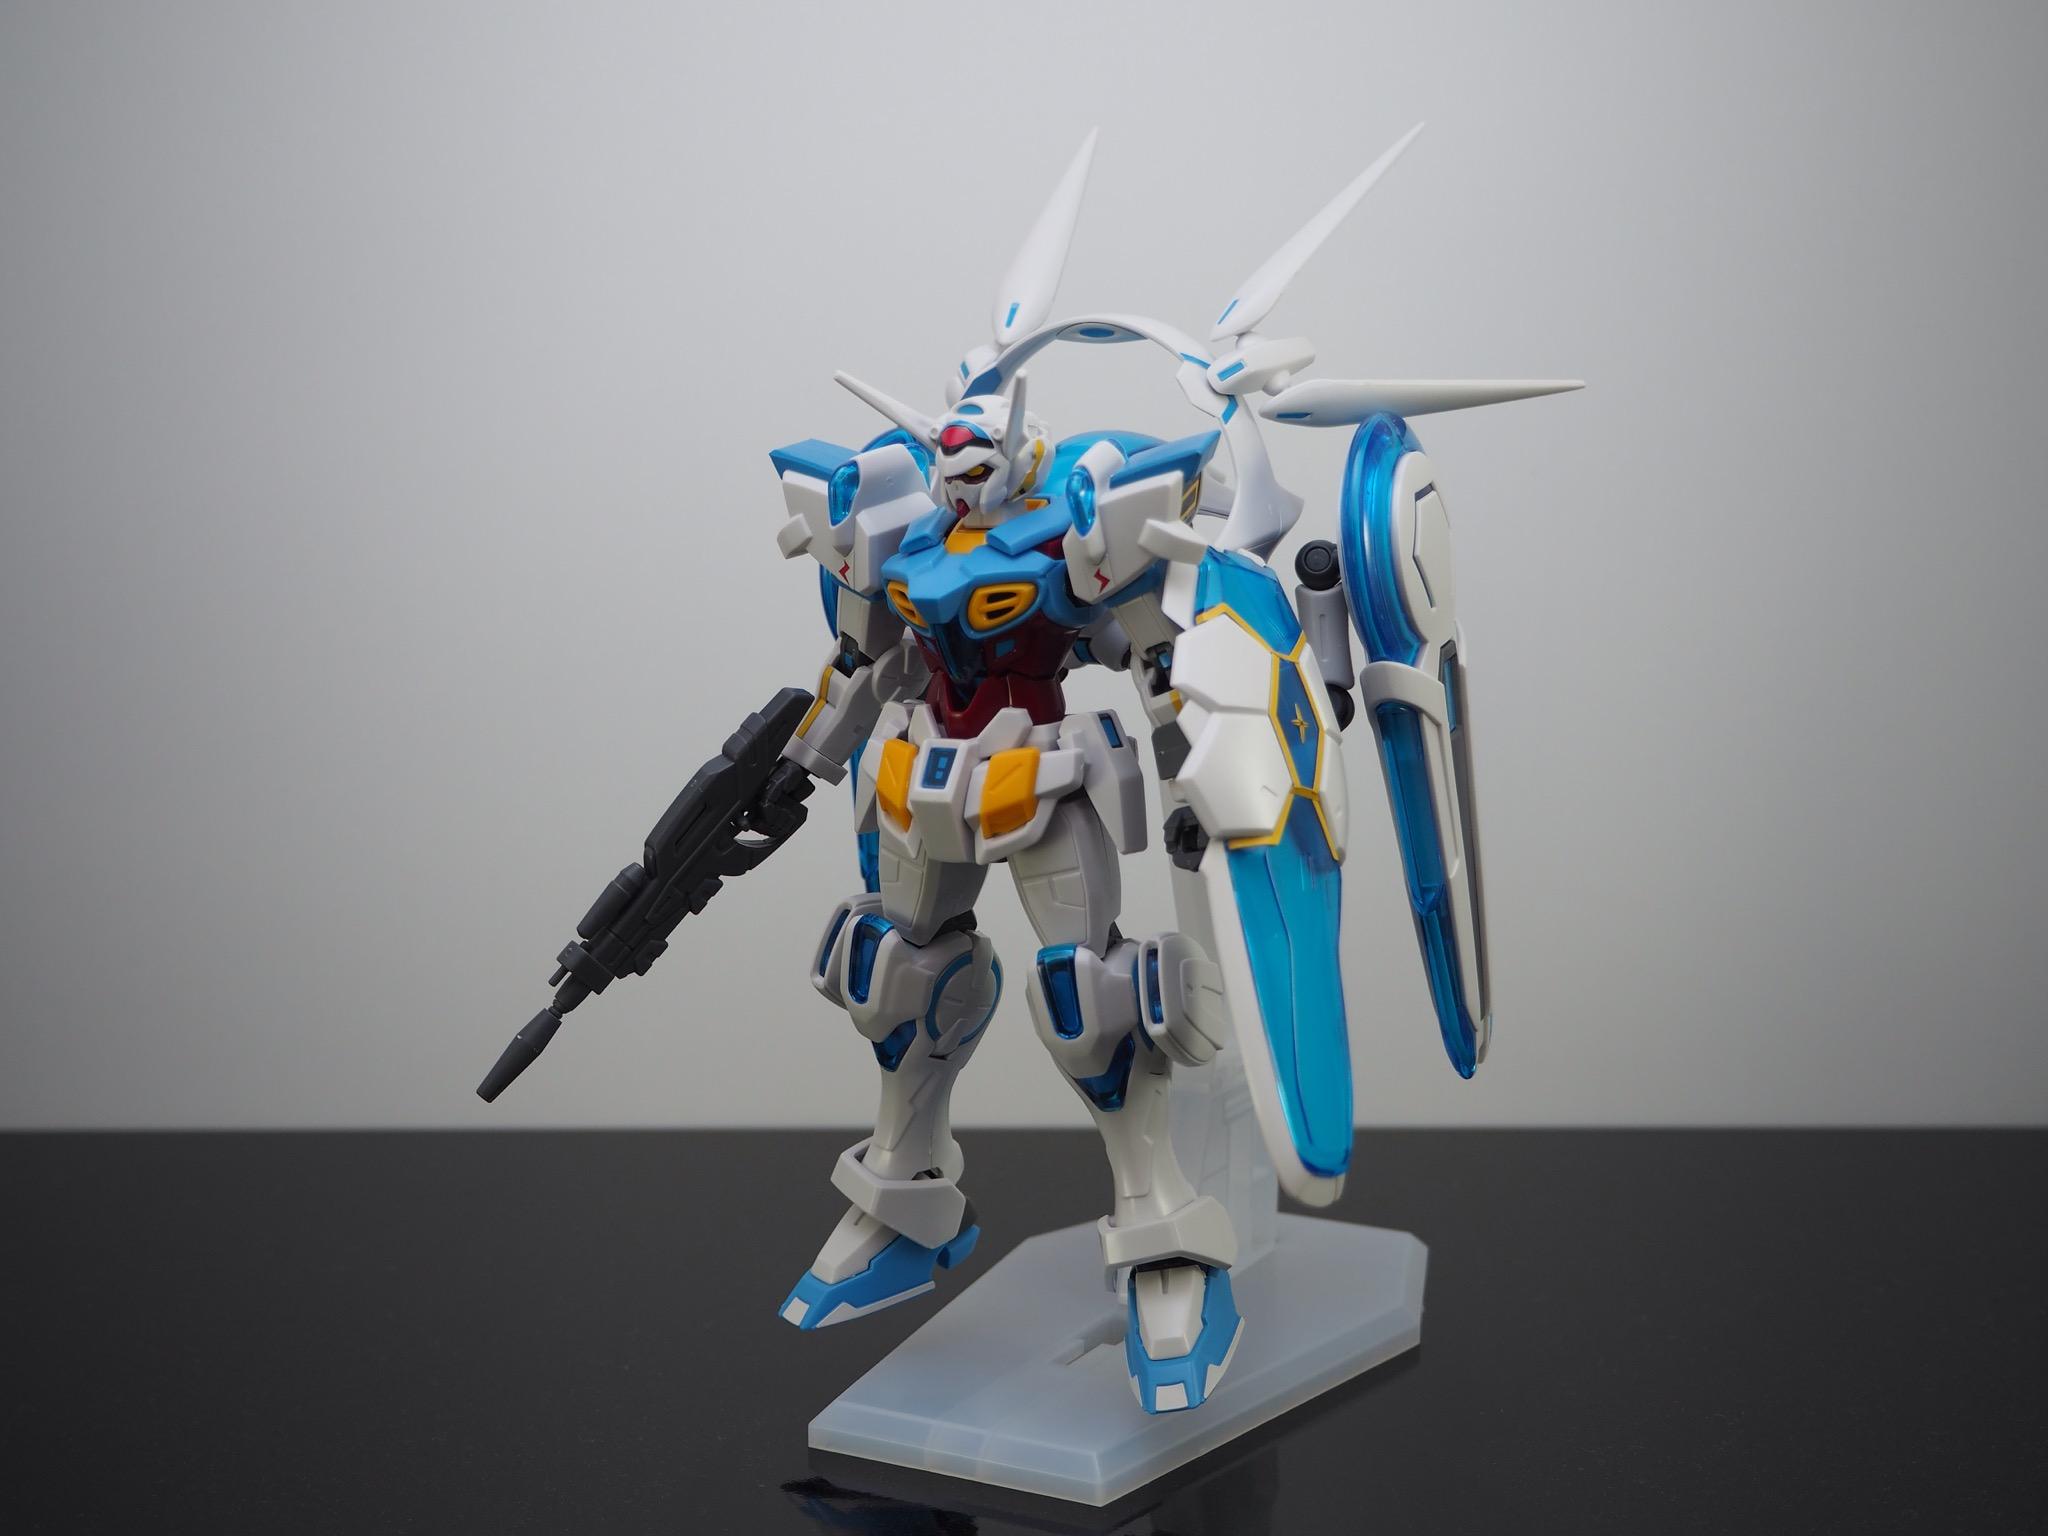 HG 1/144 YG-111 G-セルフ (パーフェクトパック装備型) [Gundam G-Self Perfect Pack]